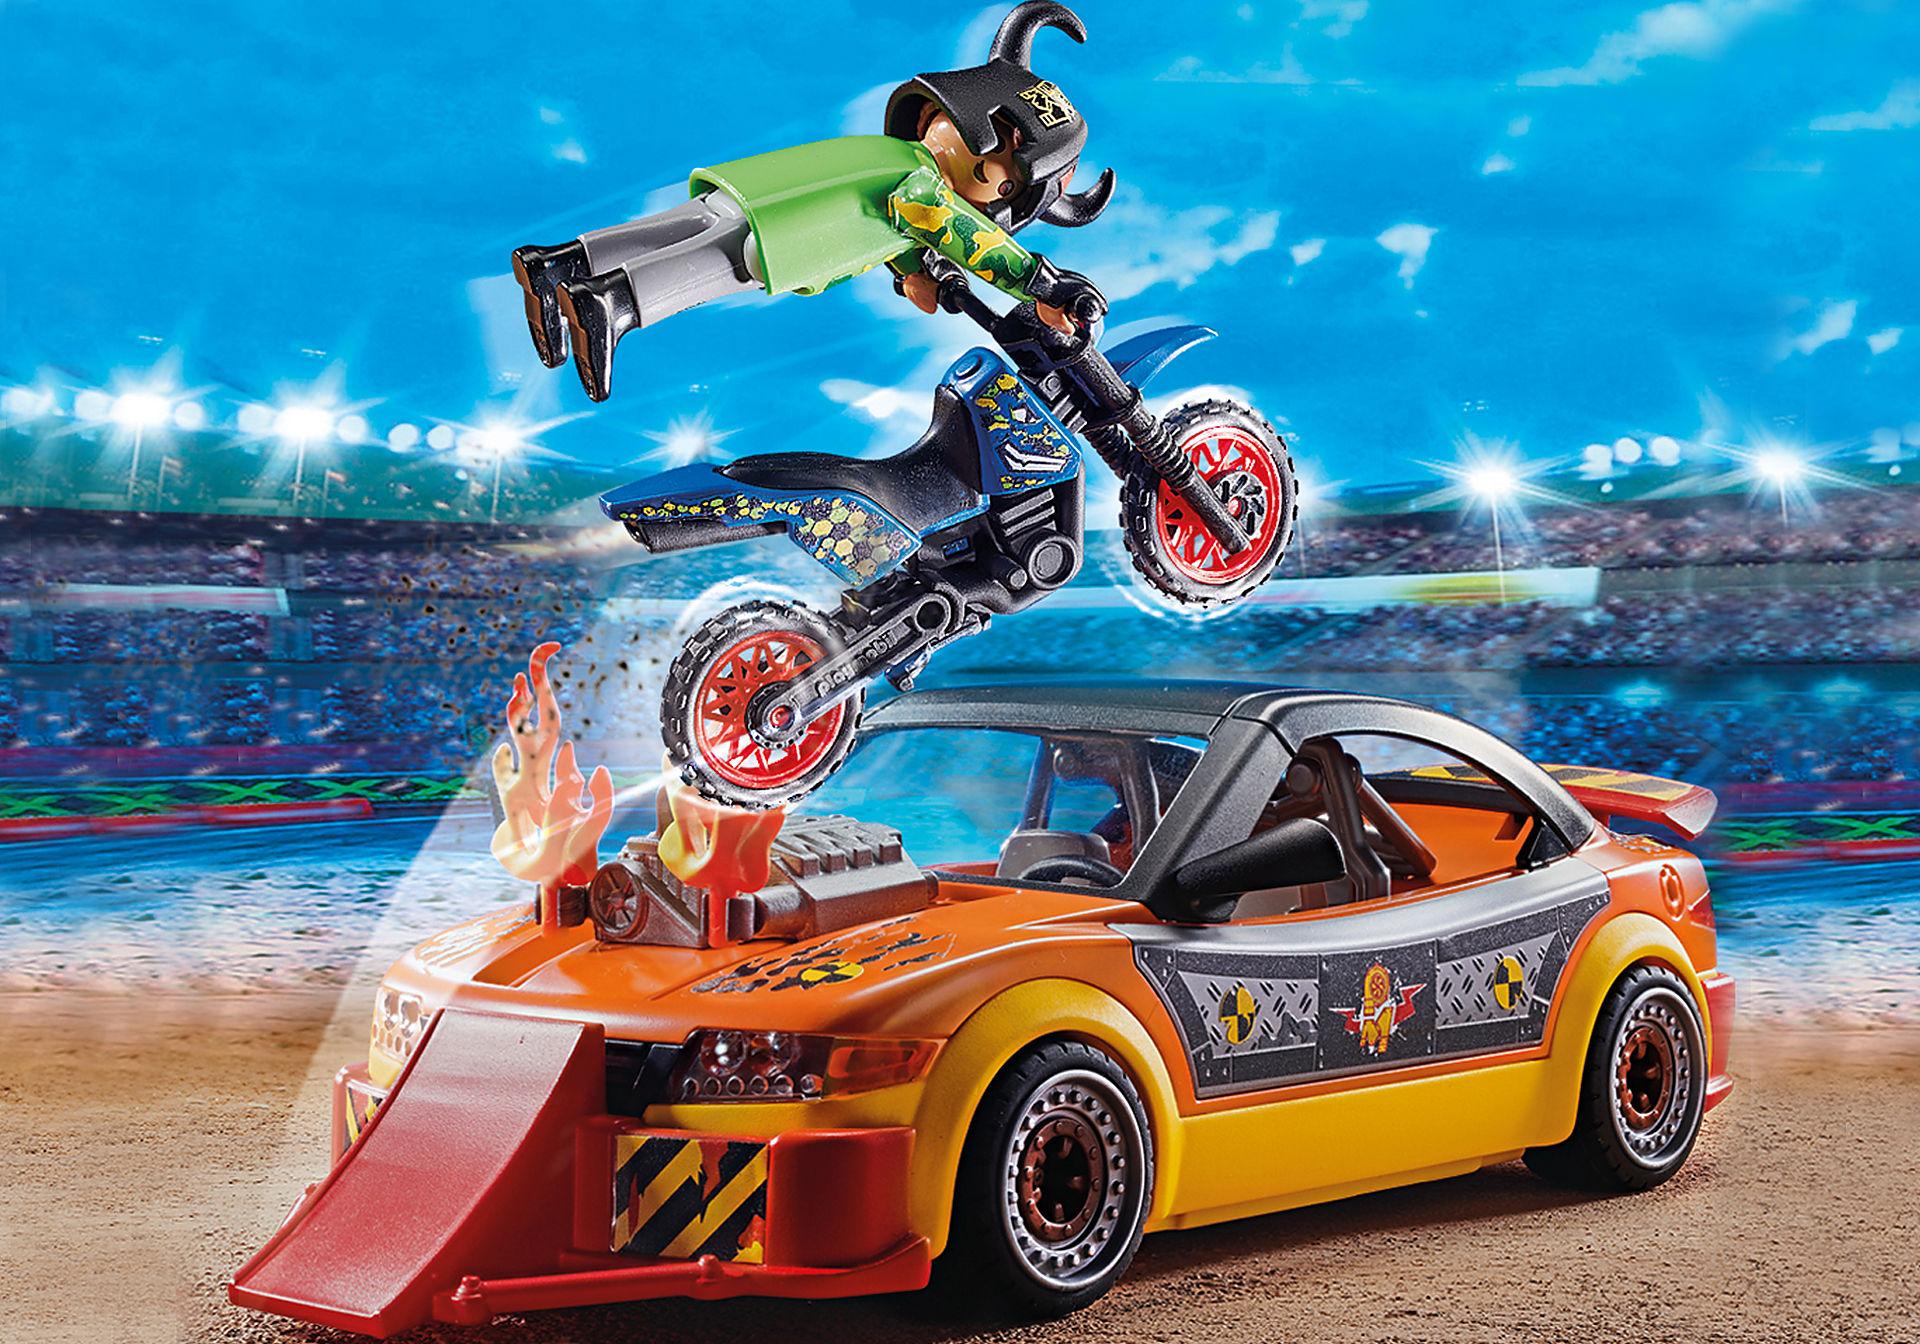 70551 Stunt Show Crash Car zoom image4